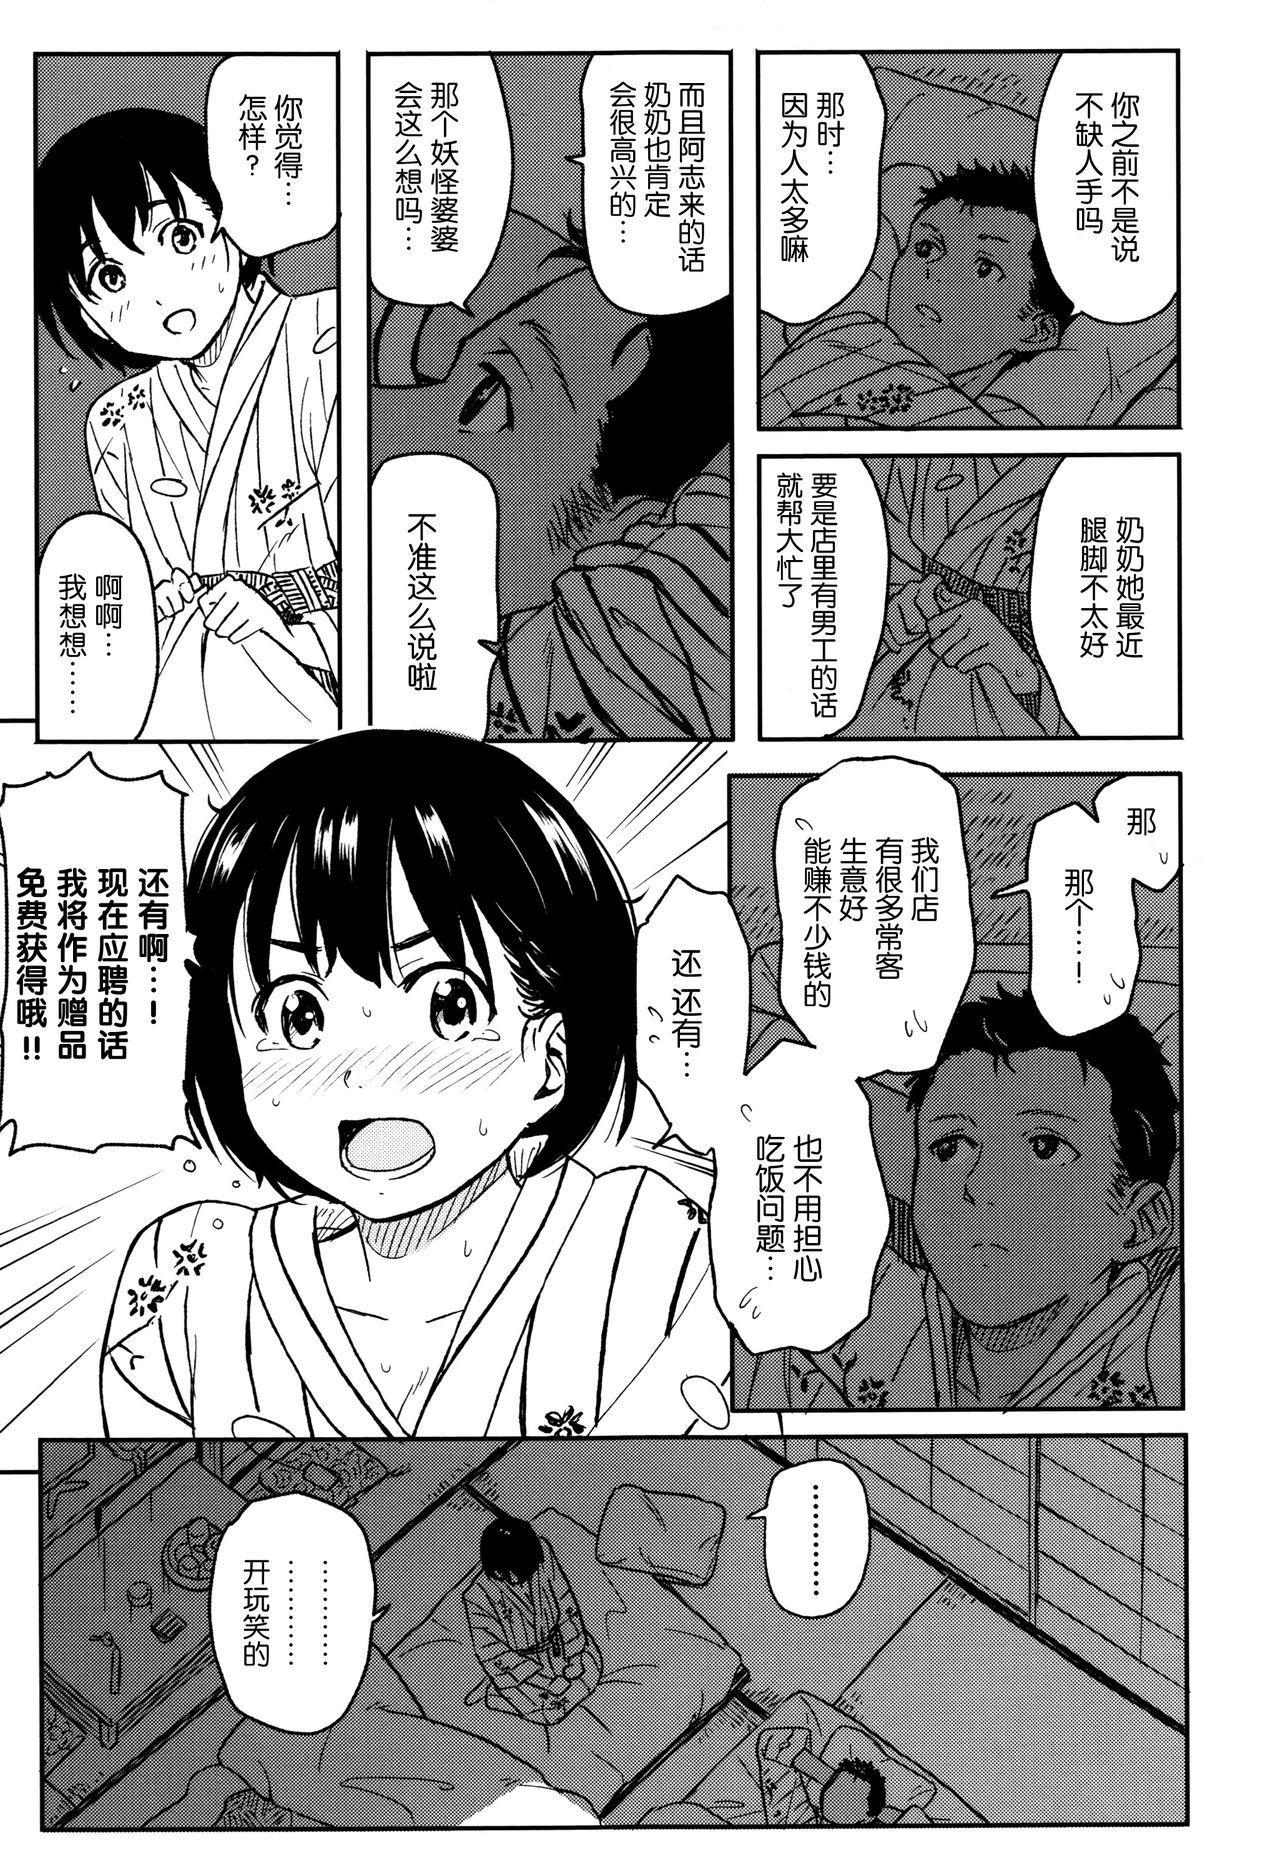 Tokubetsu na Mainichi - Special daily 185